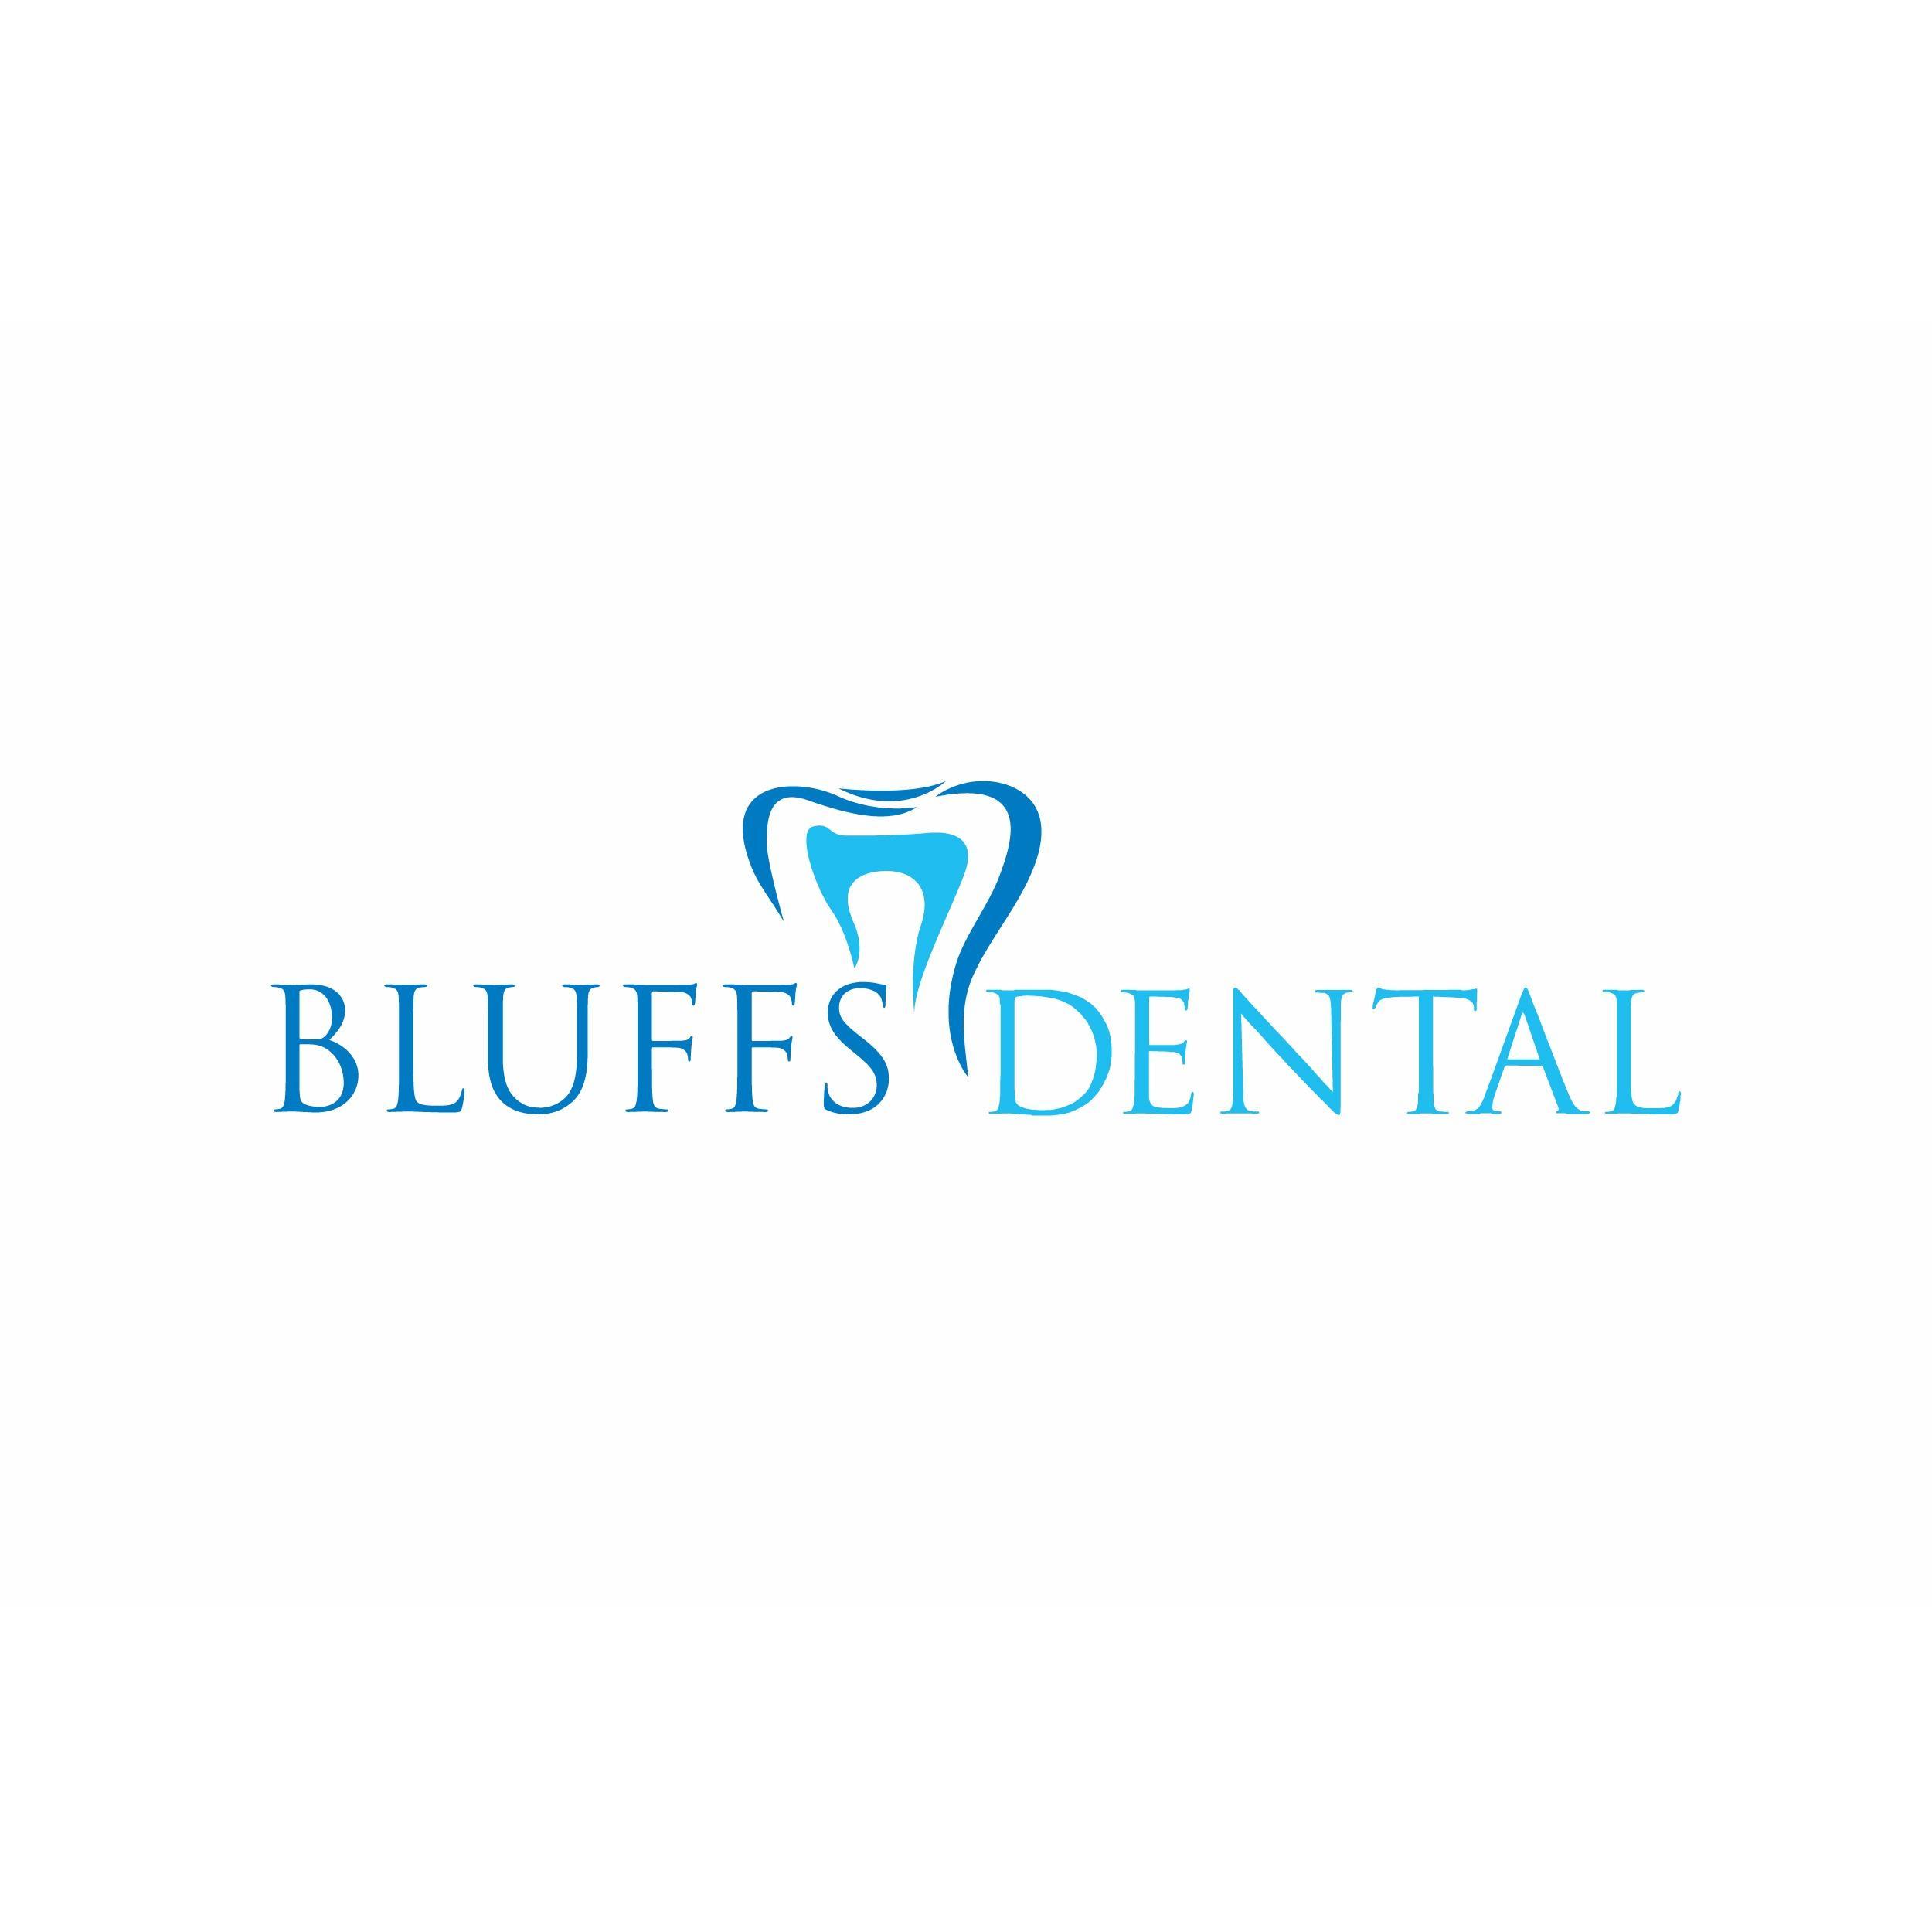 Bluffs Dental